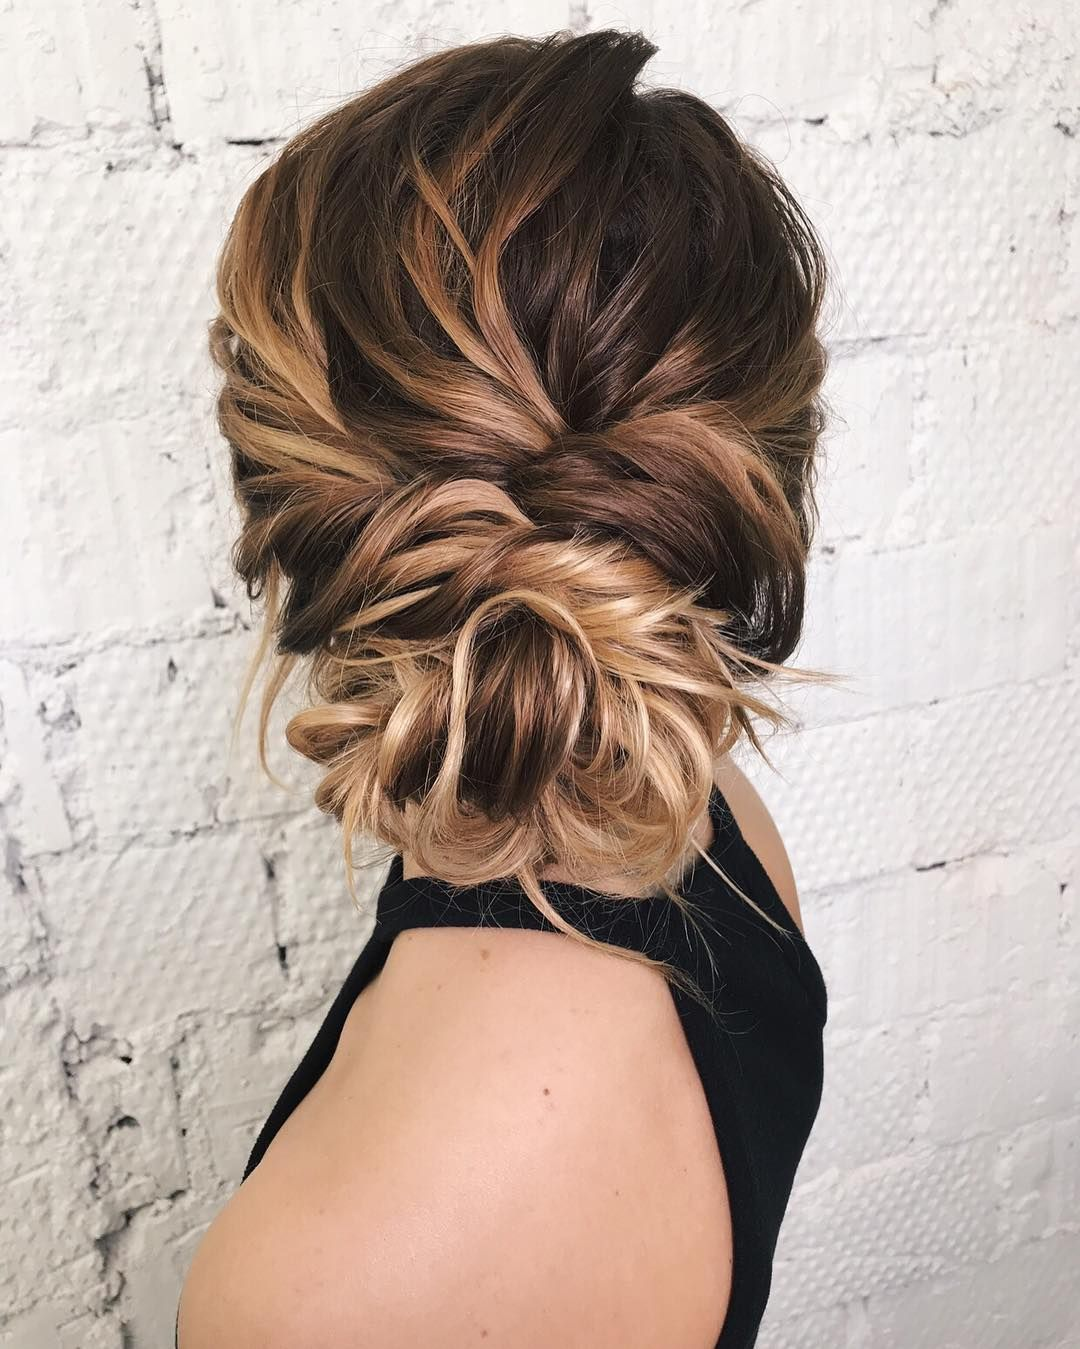 Textured Updo Updo Wedding Hairstylesupdo Hairstylesmessy Updos Bridal Hairstyles